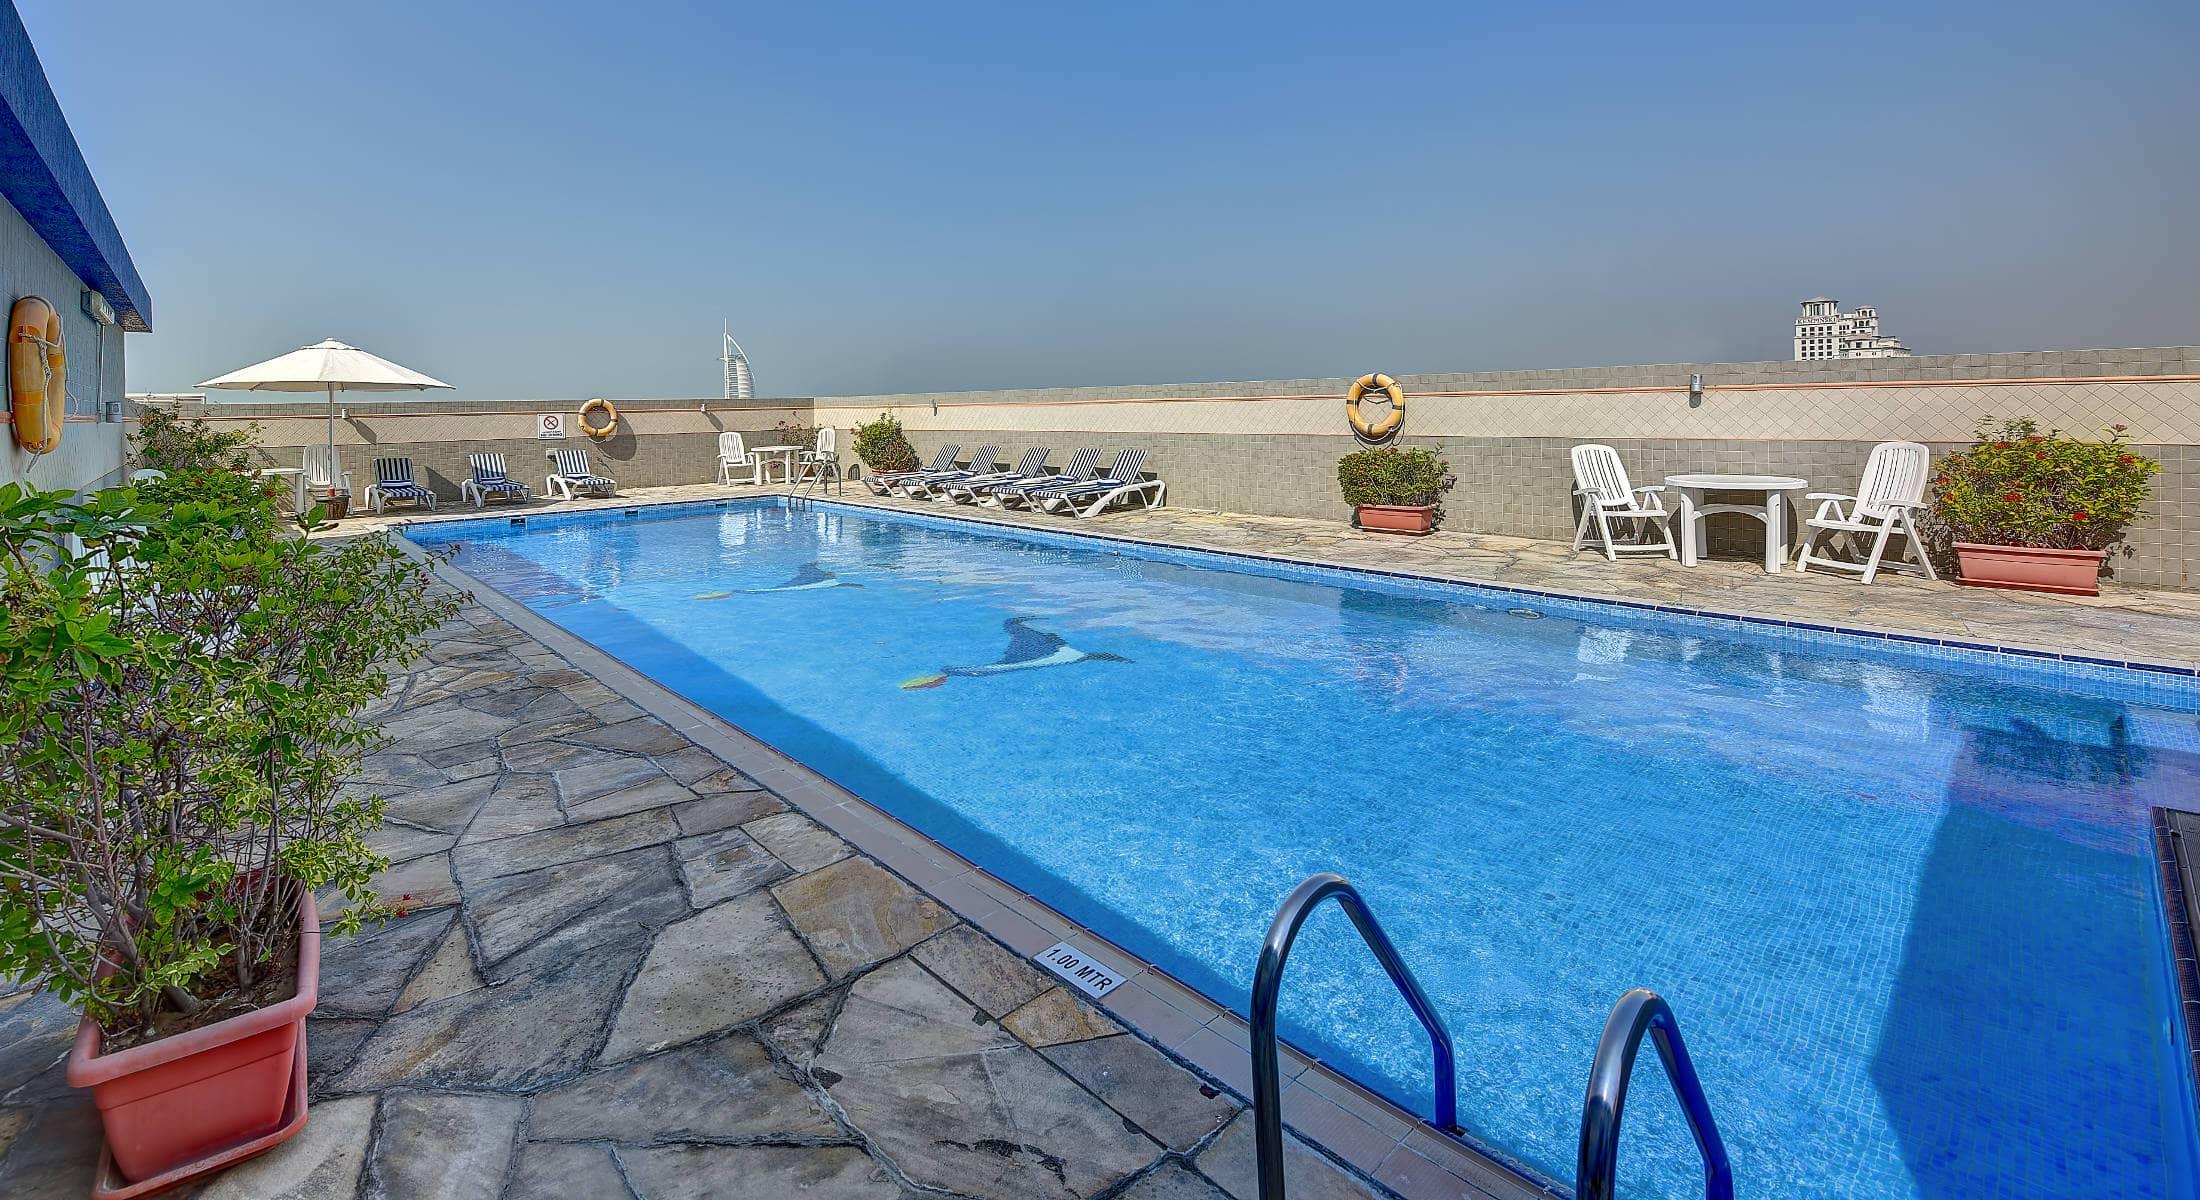 Rose Garden Hotel Apartment In Al Barsha Dubai Book A Hotel Dubai